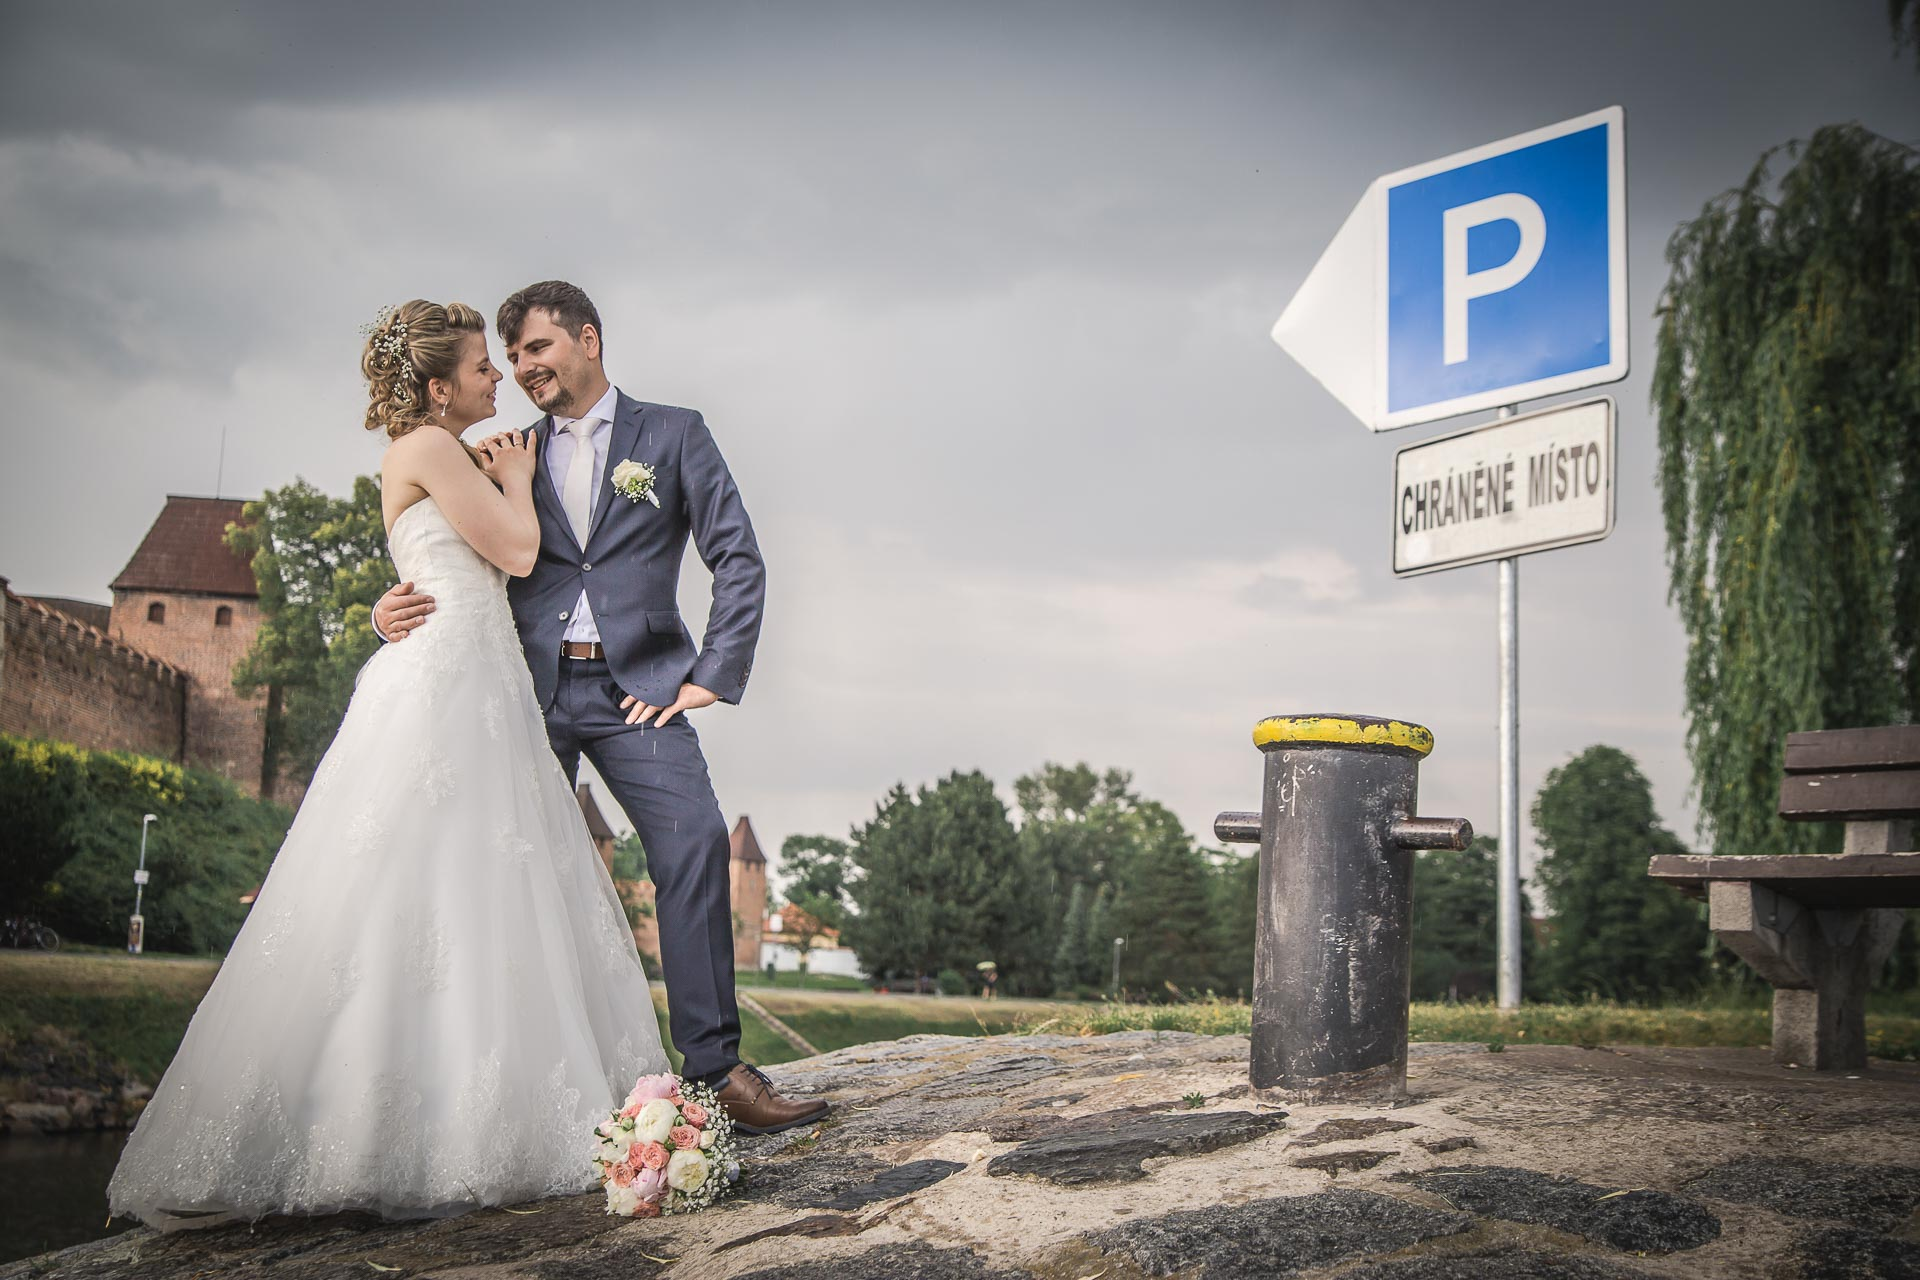 Svatební-fotograf-Nymburk-6219